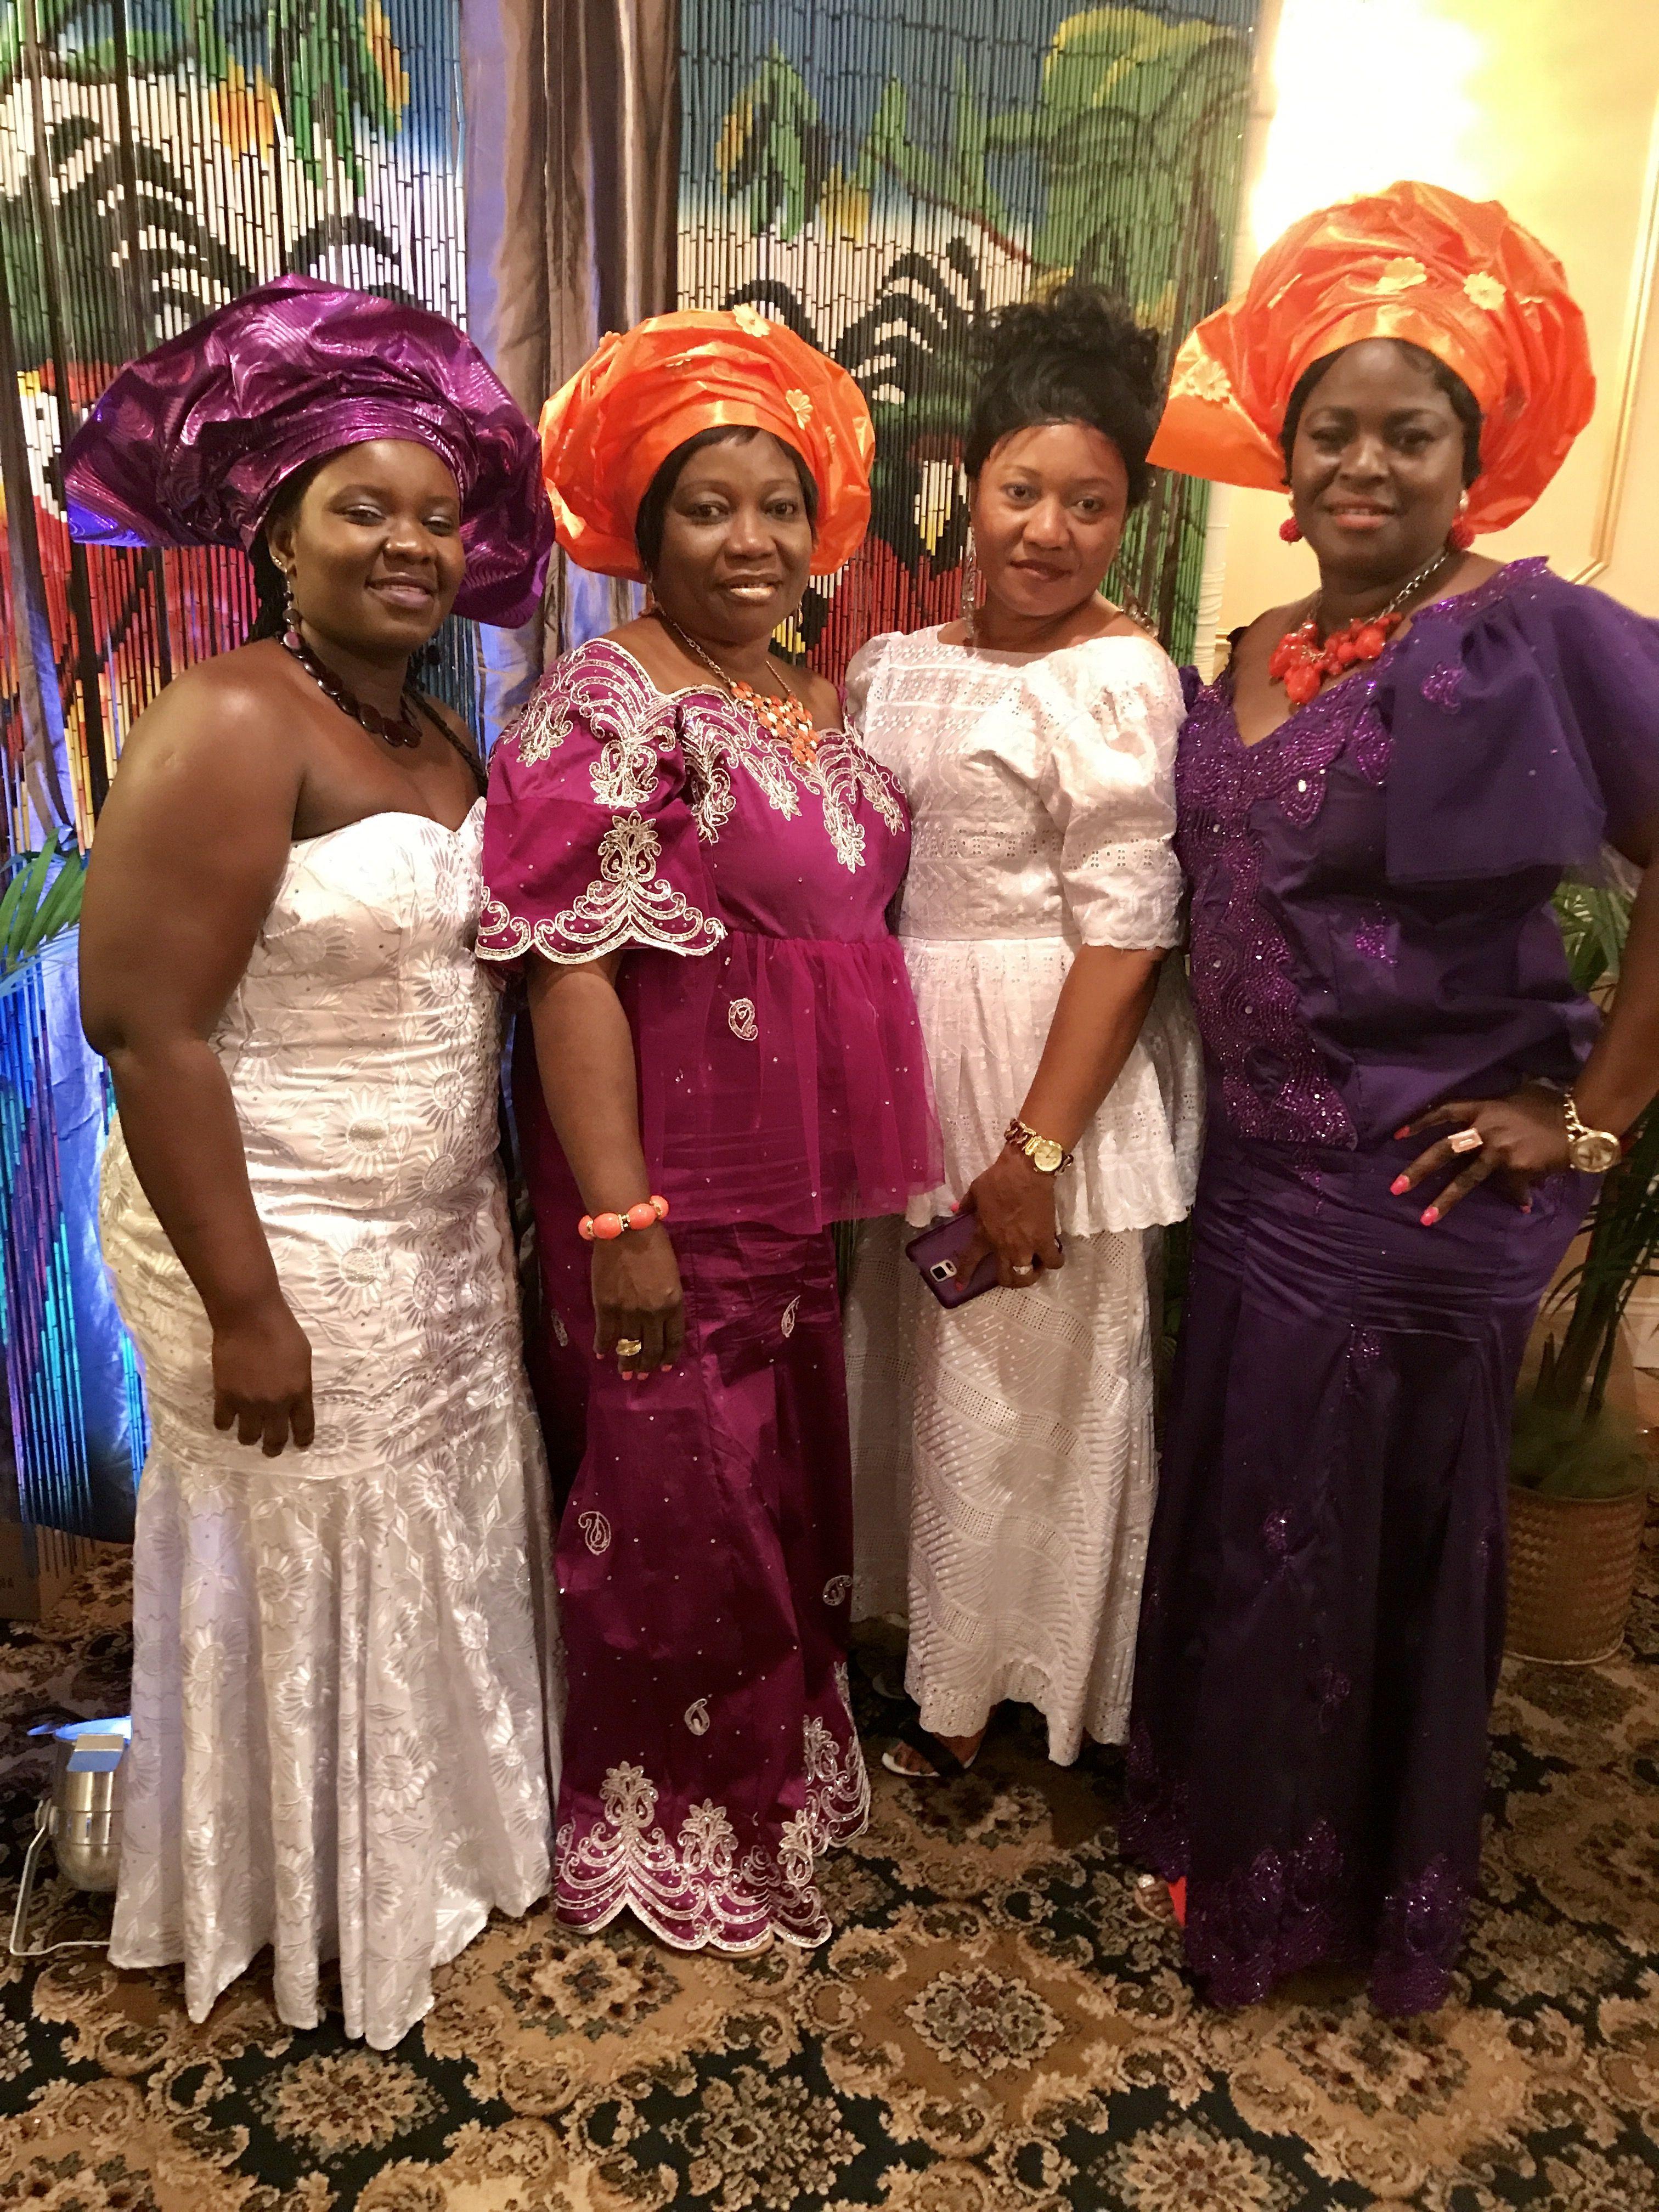 Nigerian wedding decoration images  Pin by Kpannah Kporlor on DeuRE Decor Liberian Tradional Wedding in